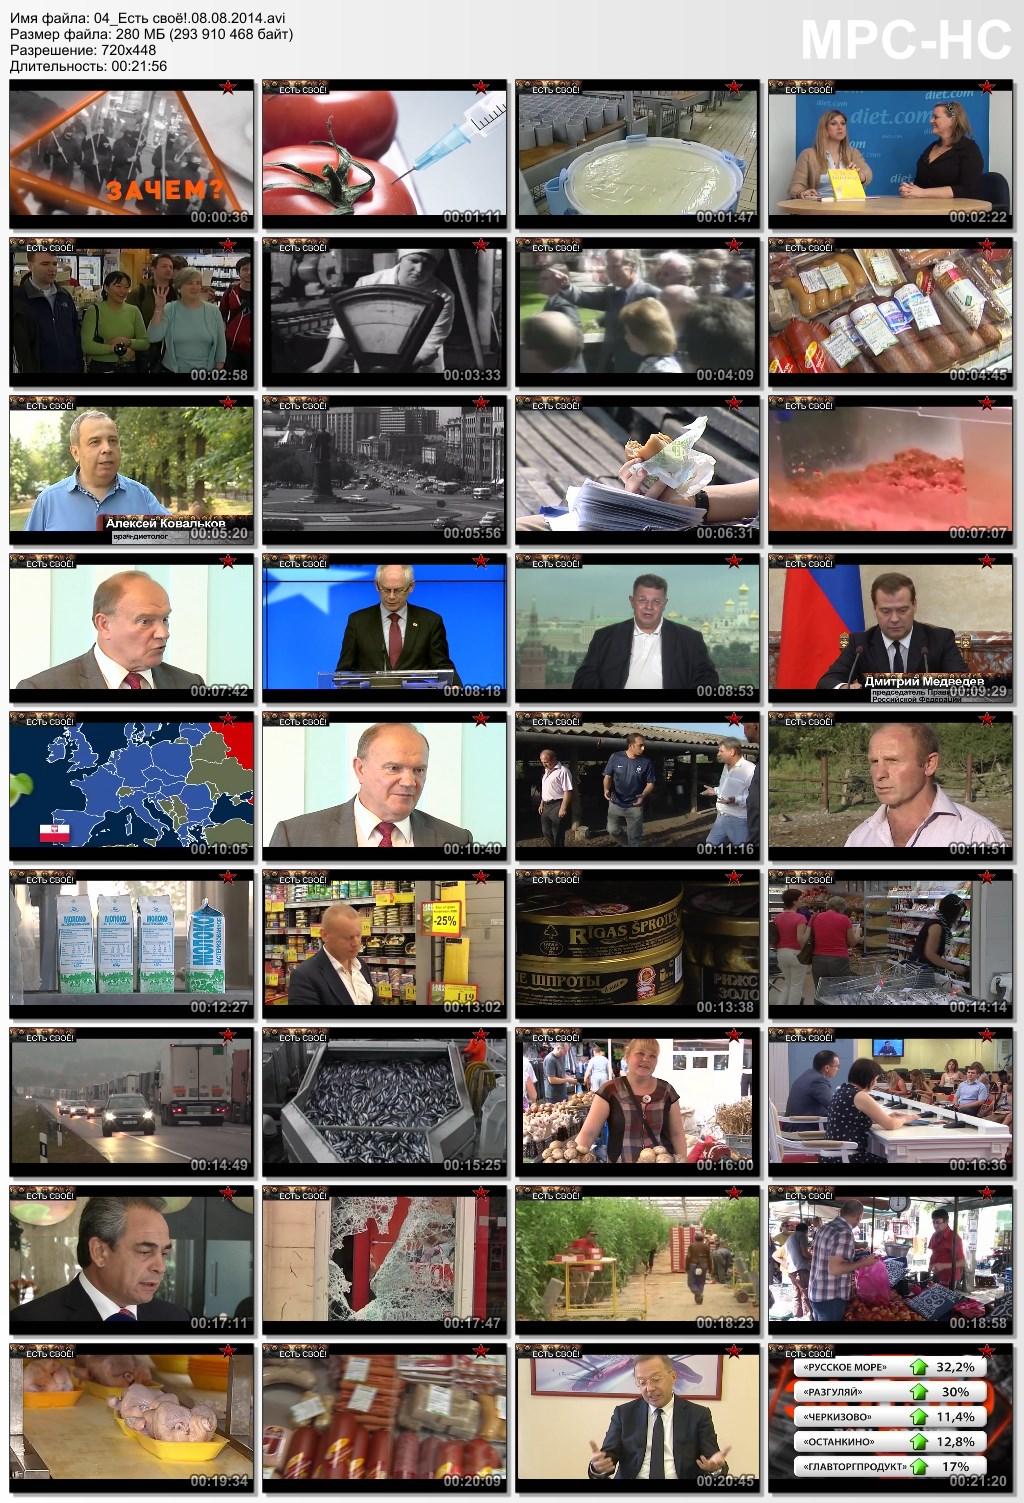 http://i64.fastpic.ru/big/2014/1127/9e/b6f4ca1fff112b68e57155cbf7bb7a9e.jpg